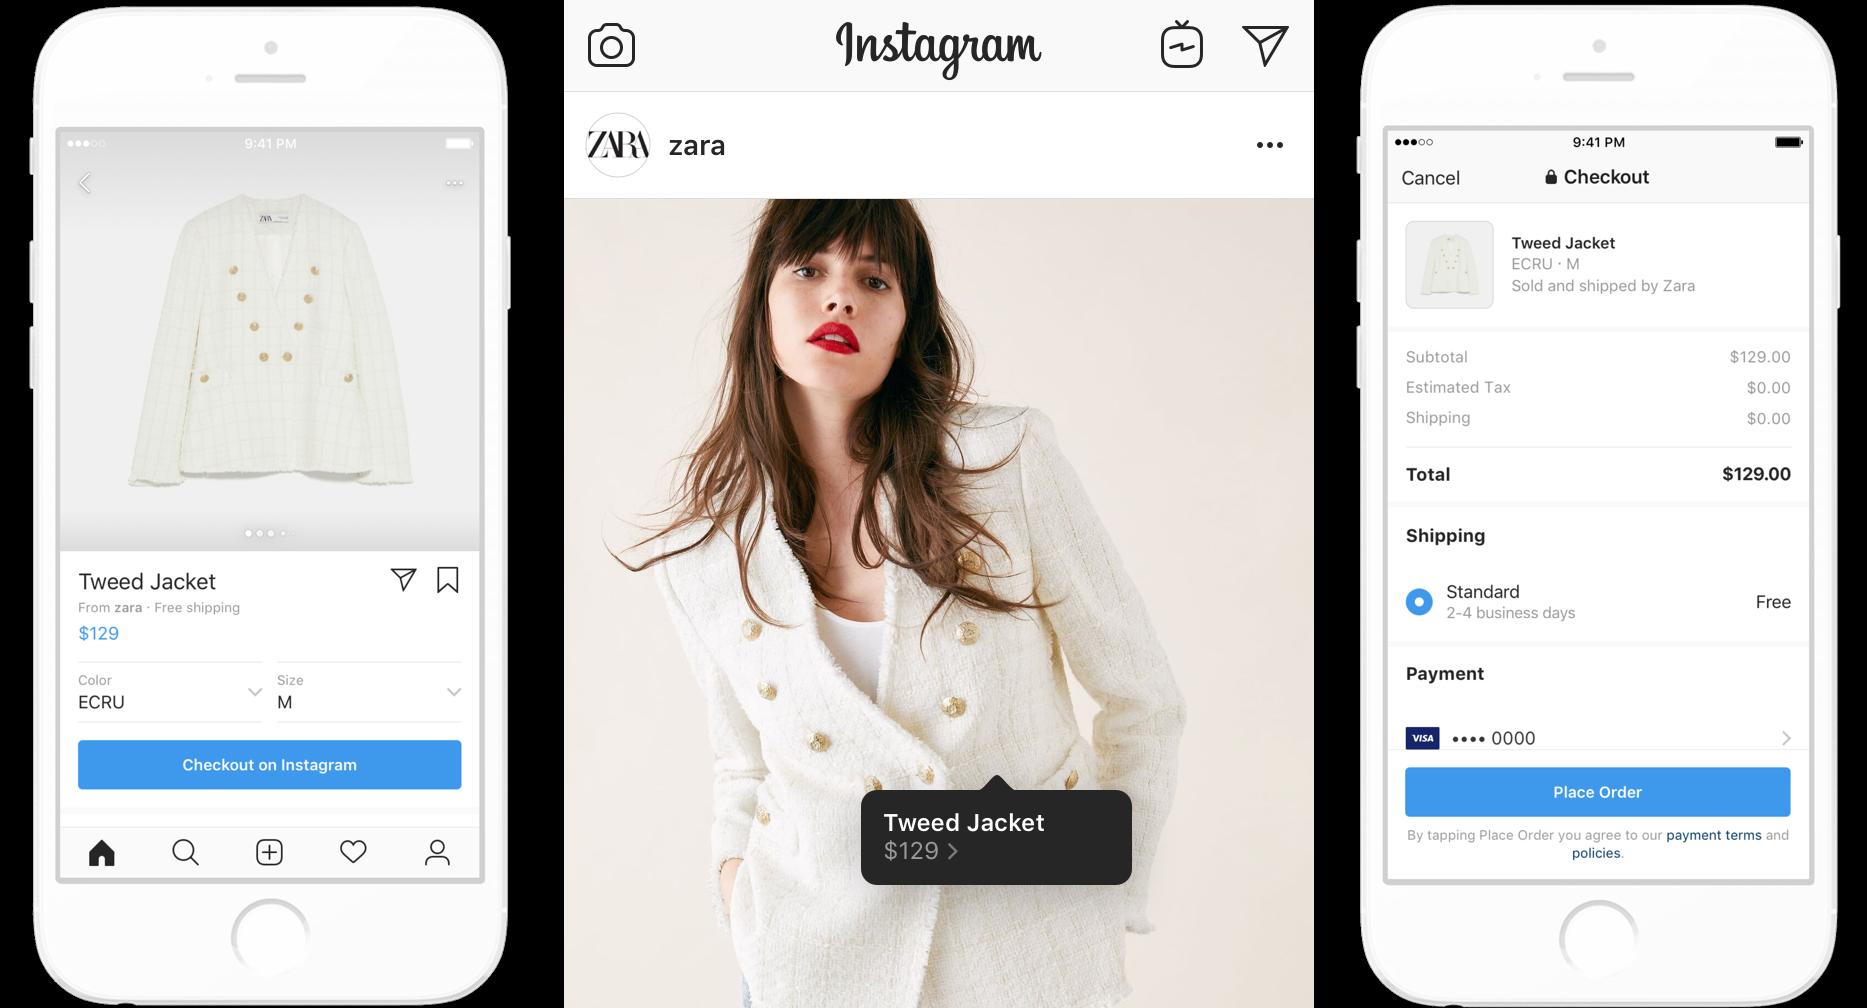 Bí quyết xây dựng một kênh Instagram kiếm tiền online